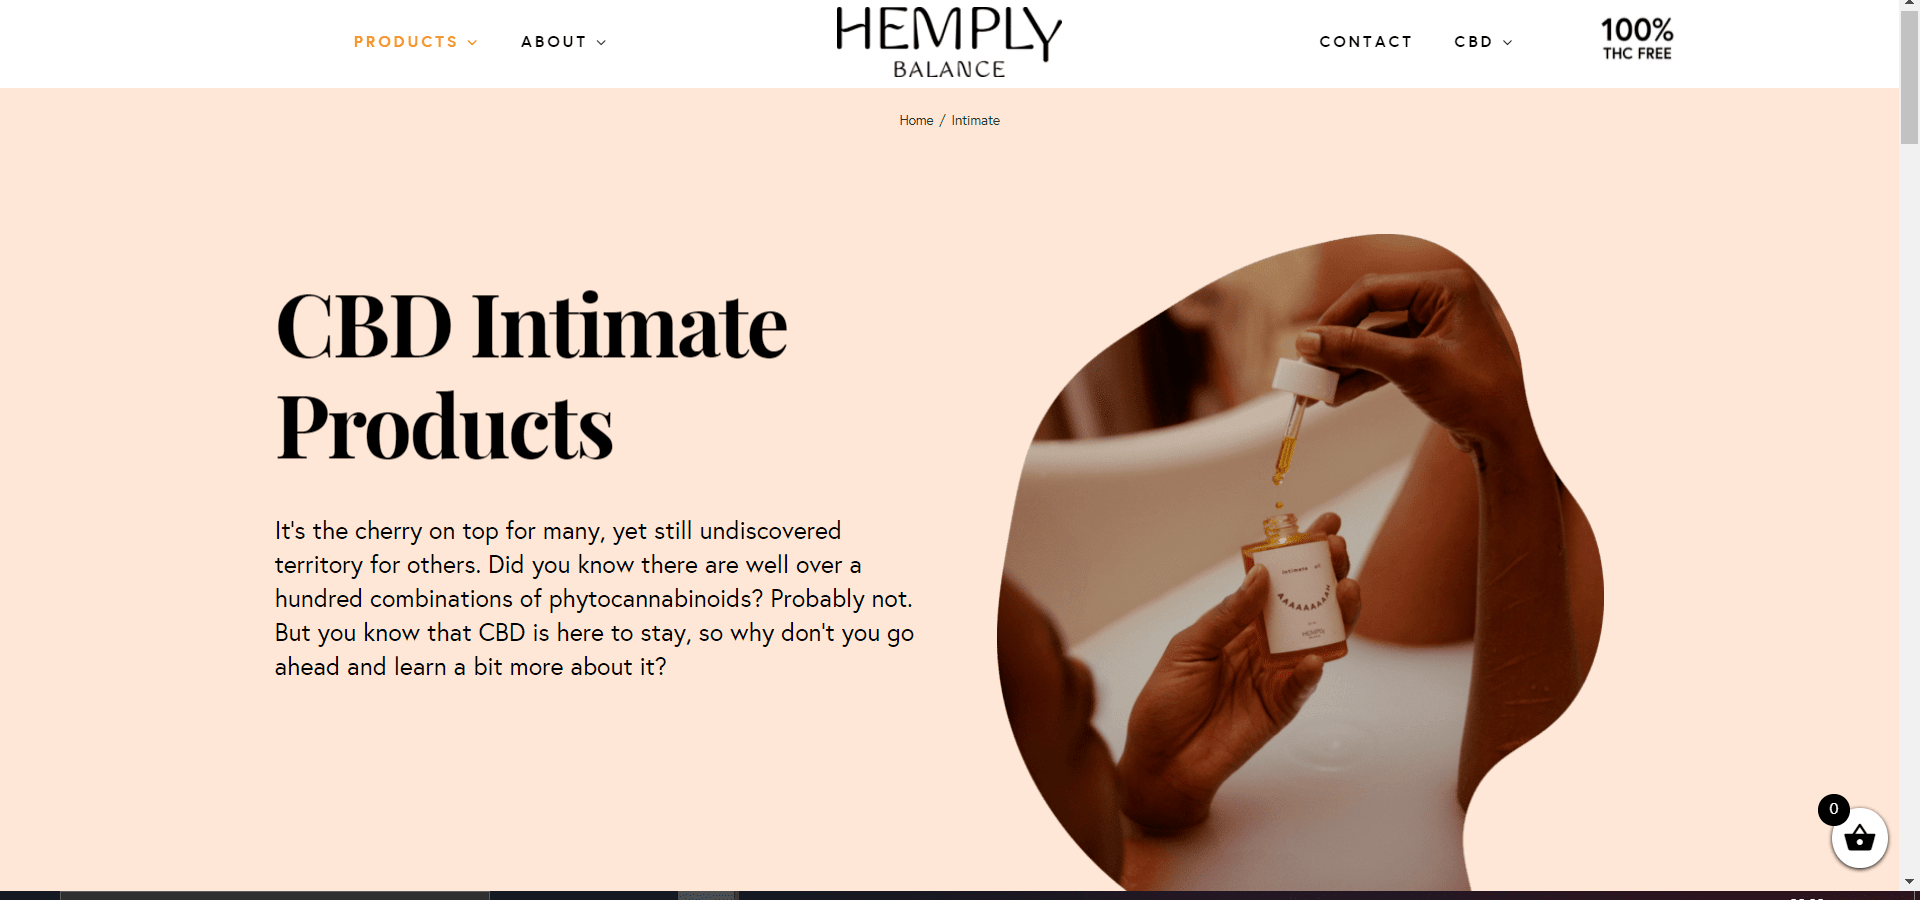 Hemply Balance